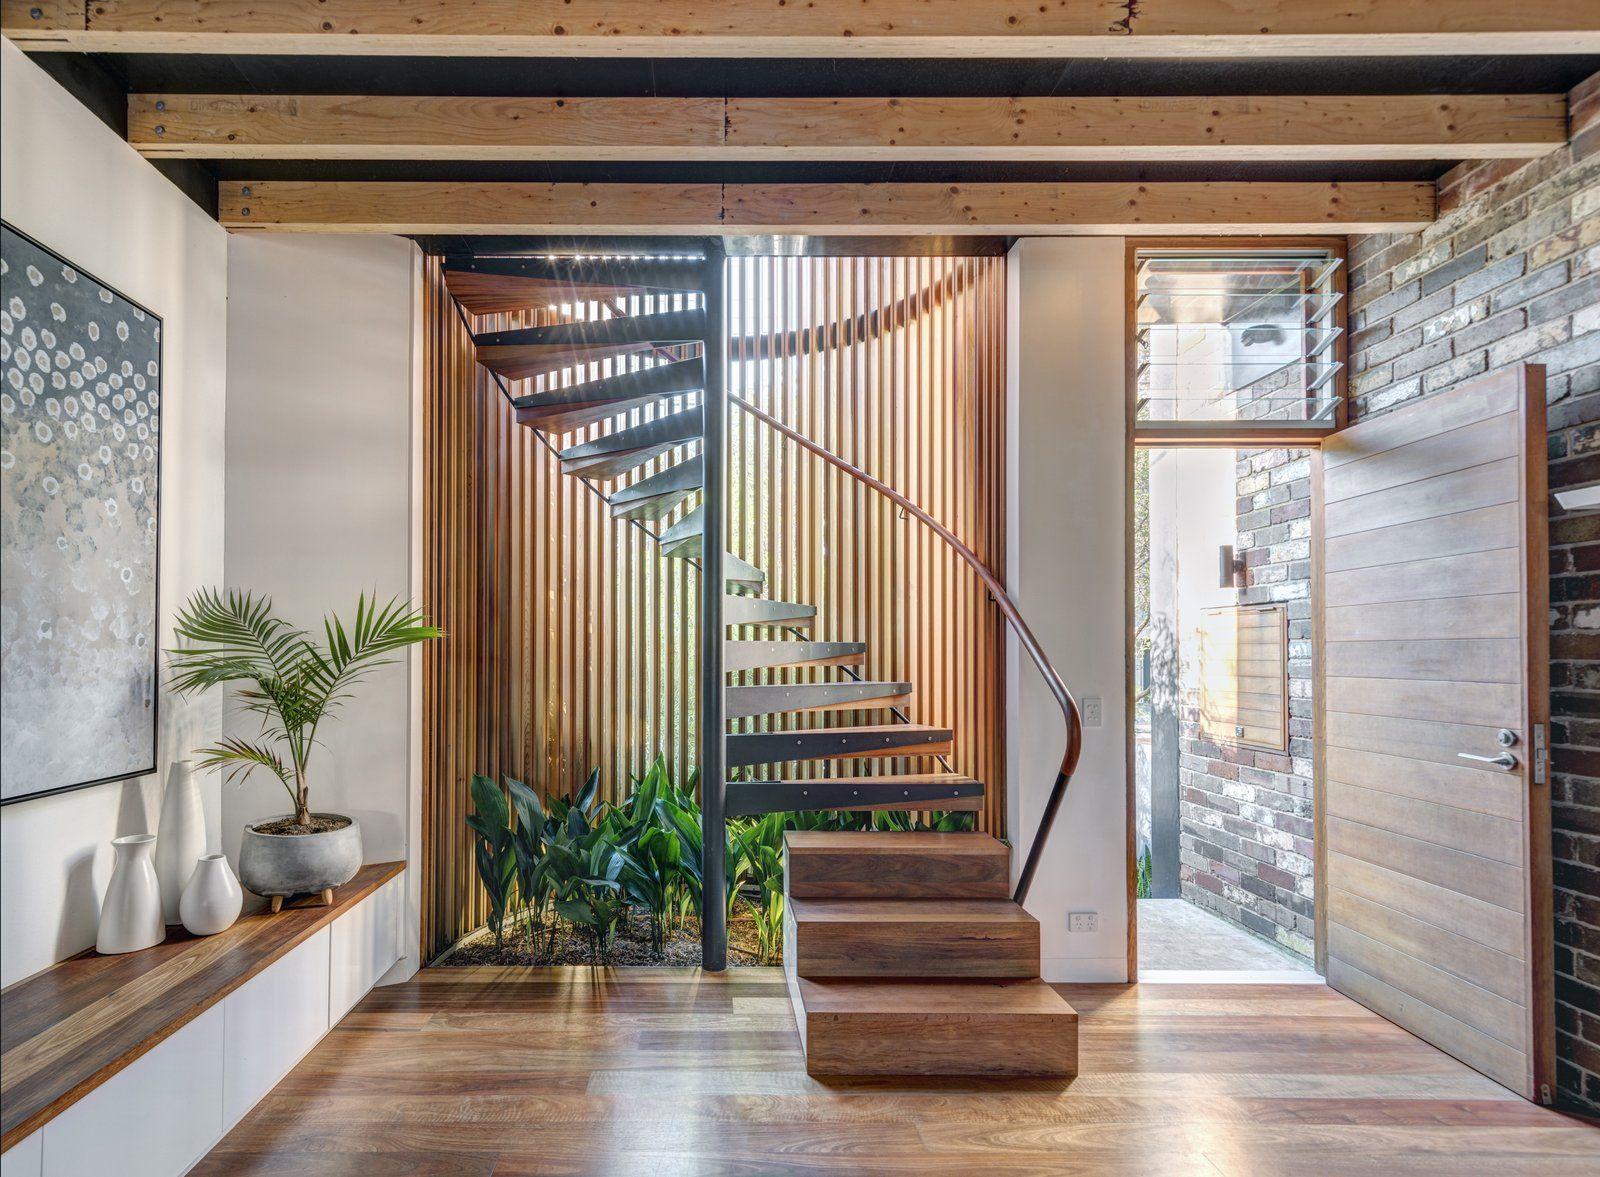 Best Aquas Perma Solar Firma By Cplusc Architectural Workshop 400 x 300